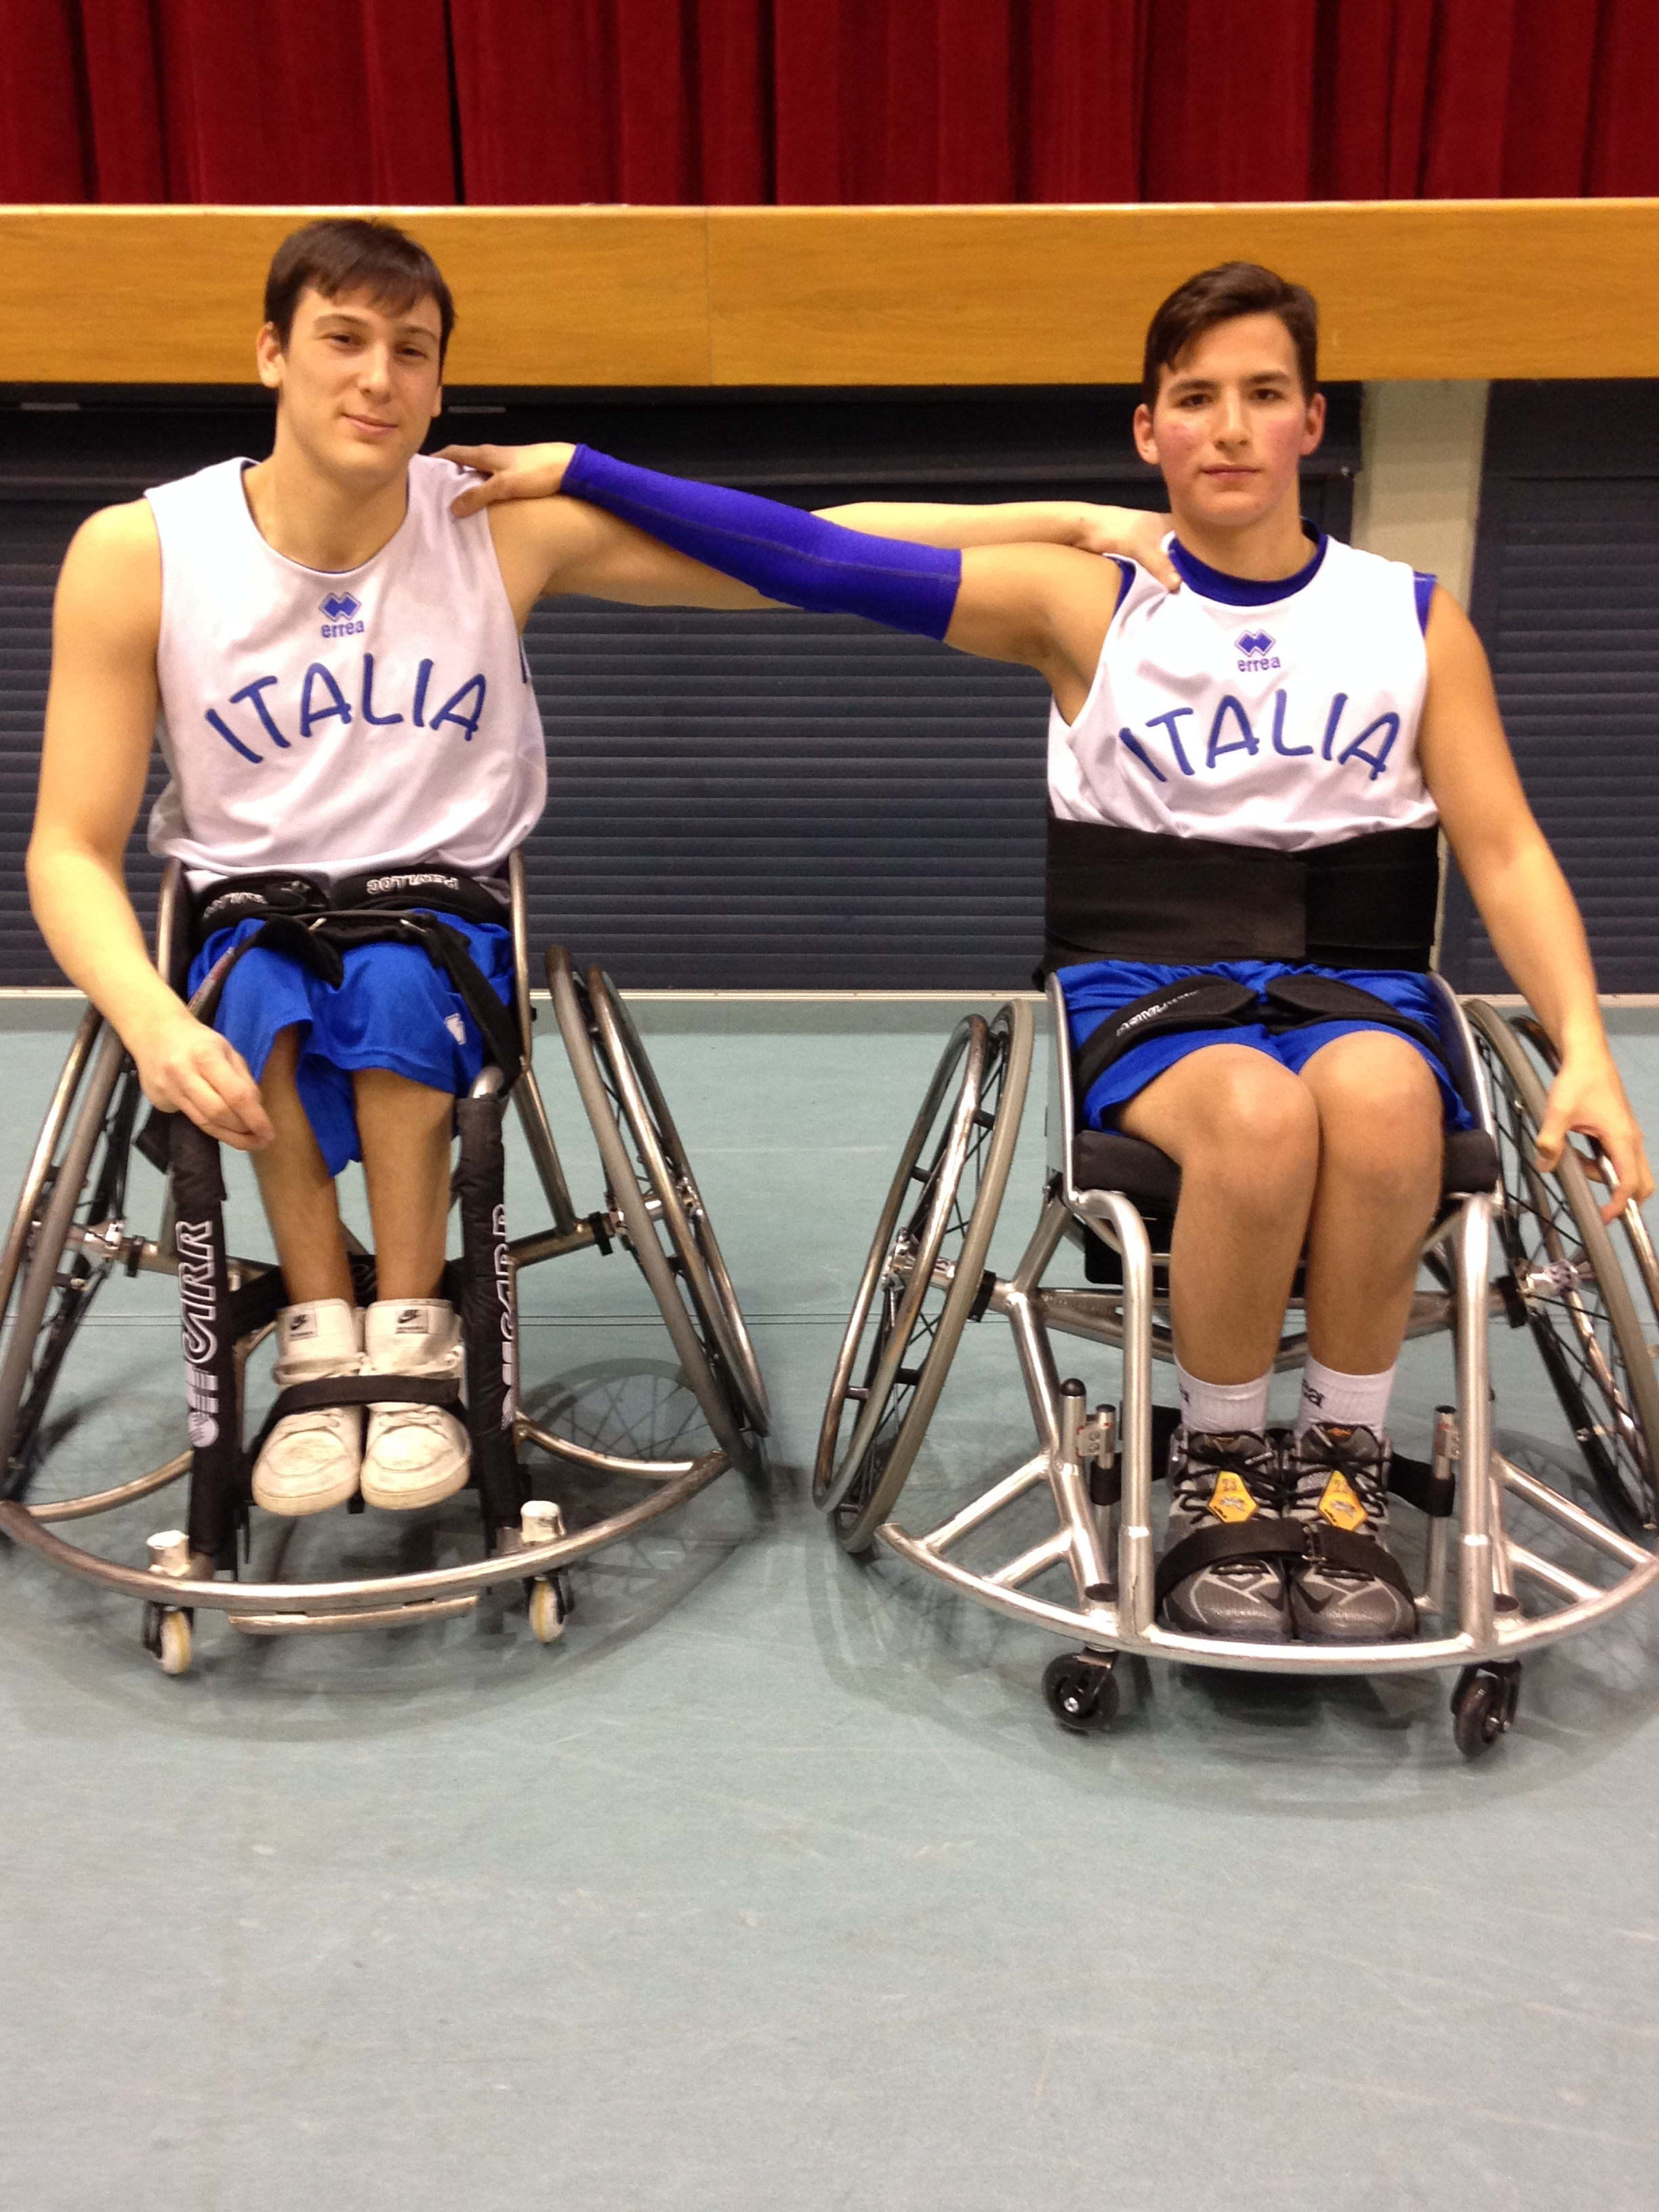 Basket in Carrozzina – Tanto Varese agli Europei Under 22